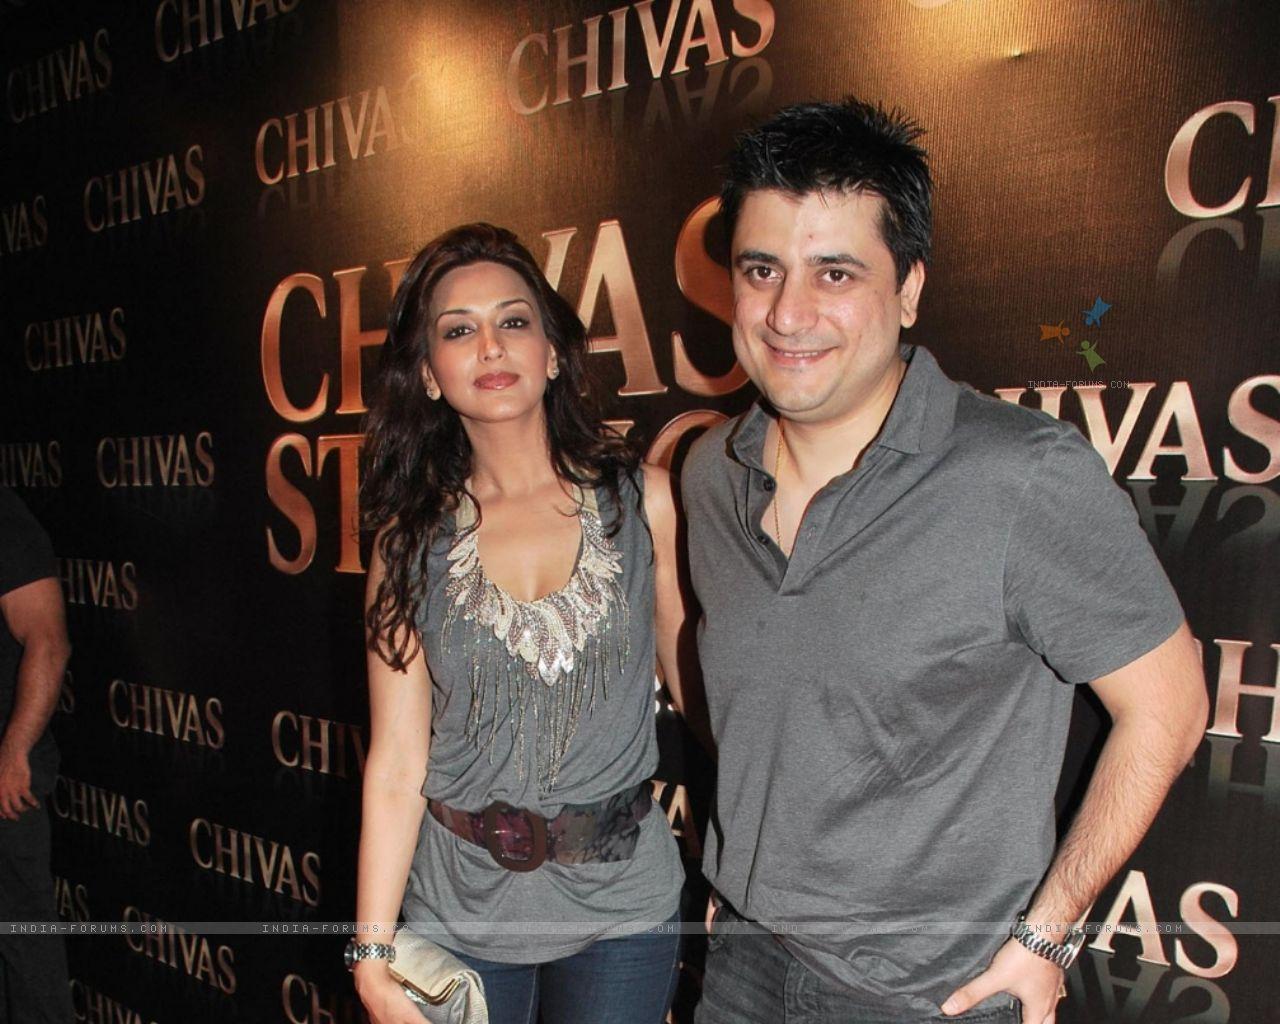 http://3.bp.blogspot.com/-xxDtWSHb13A/TecskiS3mdI/AAAAAAAALbc/y_4mxriBQlo/s1600/88280-bollywood-actress-sonali-bendre-and-her-husband-filmmaker-goldie.jpg